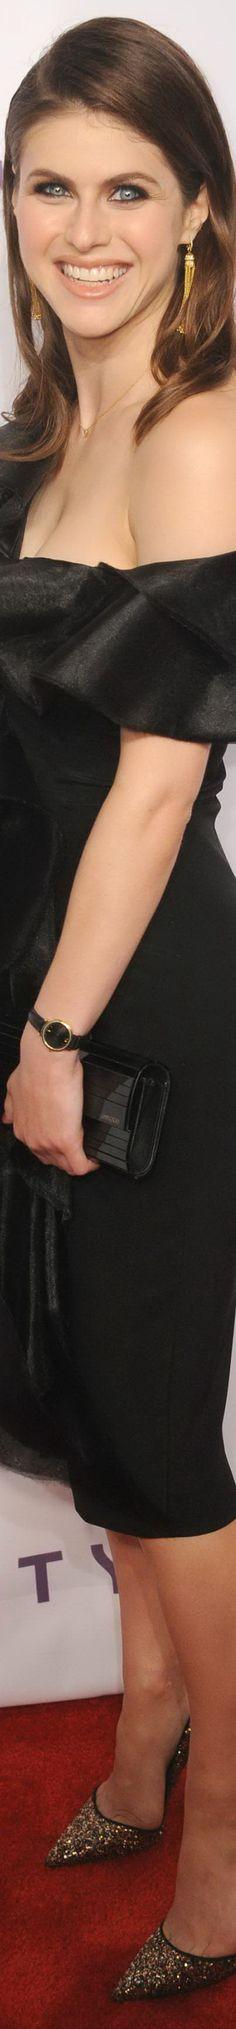 Alexandra Daddario l JB Alexandra Daddario, Photo Mannequin, Female Actresses, Musa, Hollywood Celebrities, Female Celebrities, Mannequins, Sensual, Beautiful Actresses